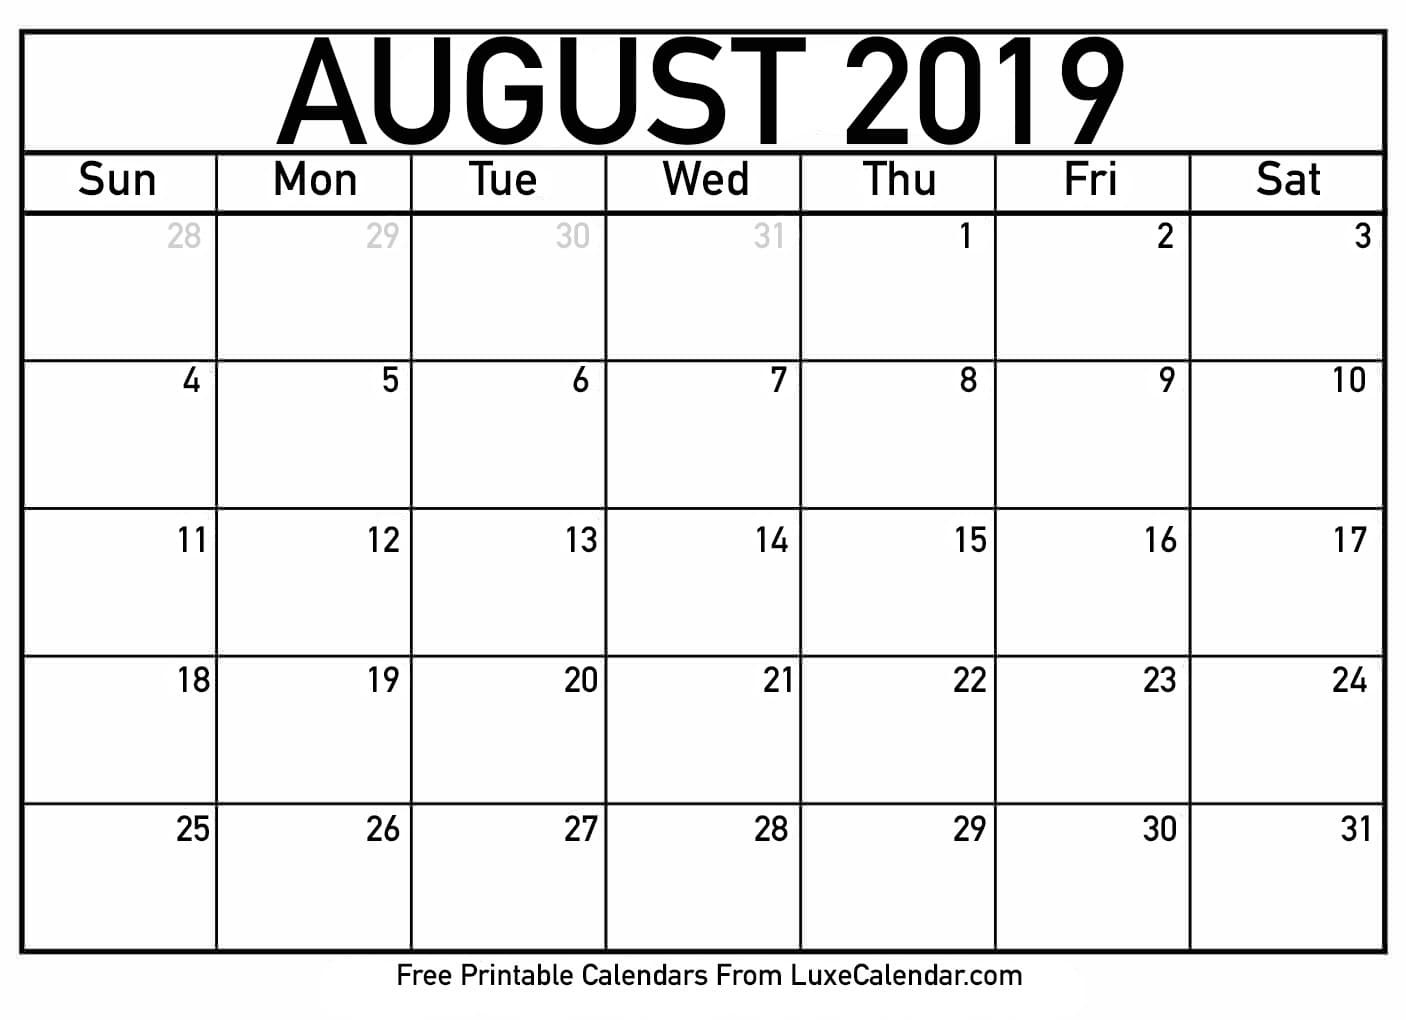 Blank August 2019 Calendar Printable - Luxe Calendar-Luxe Calendar Aug 2020 Blank Printable